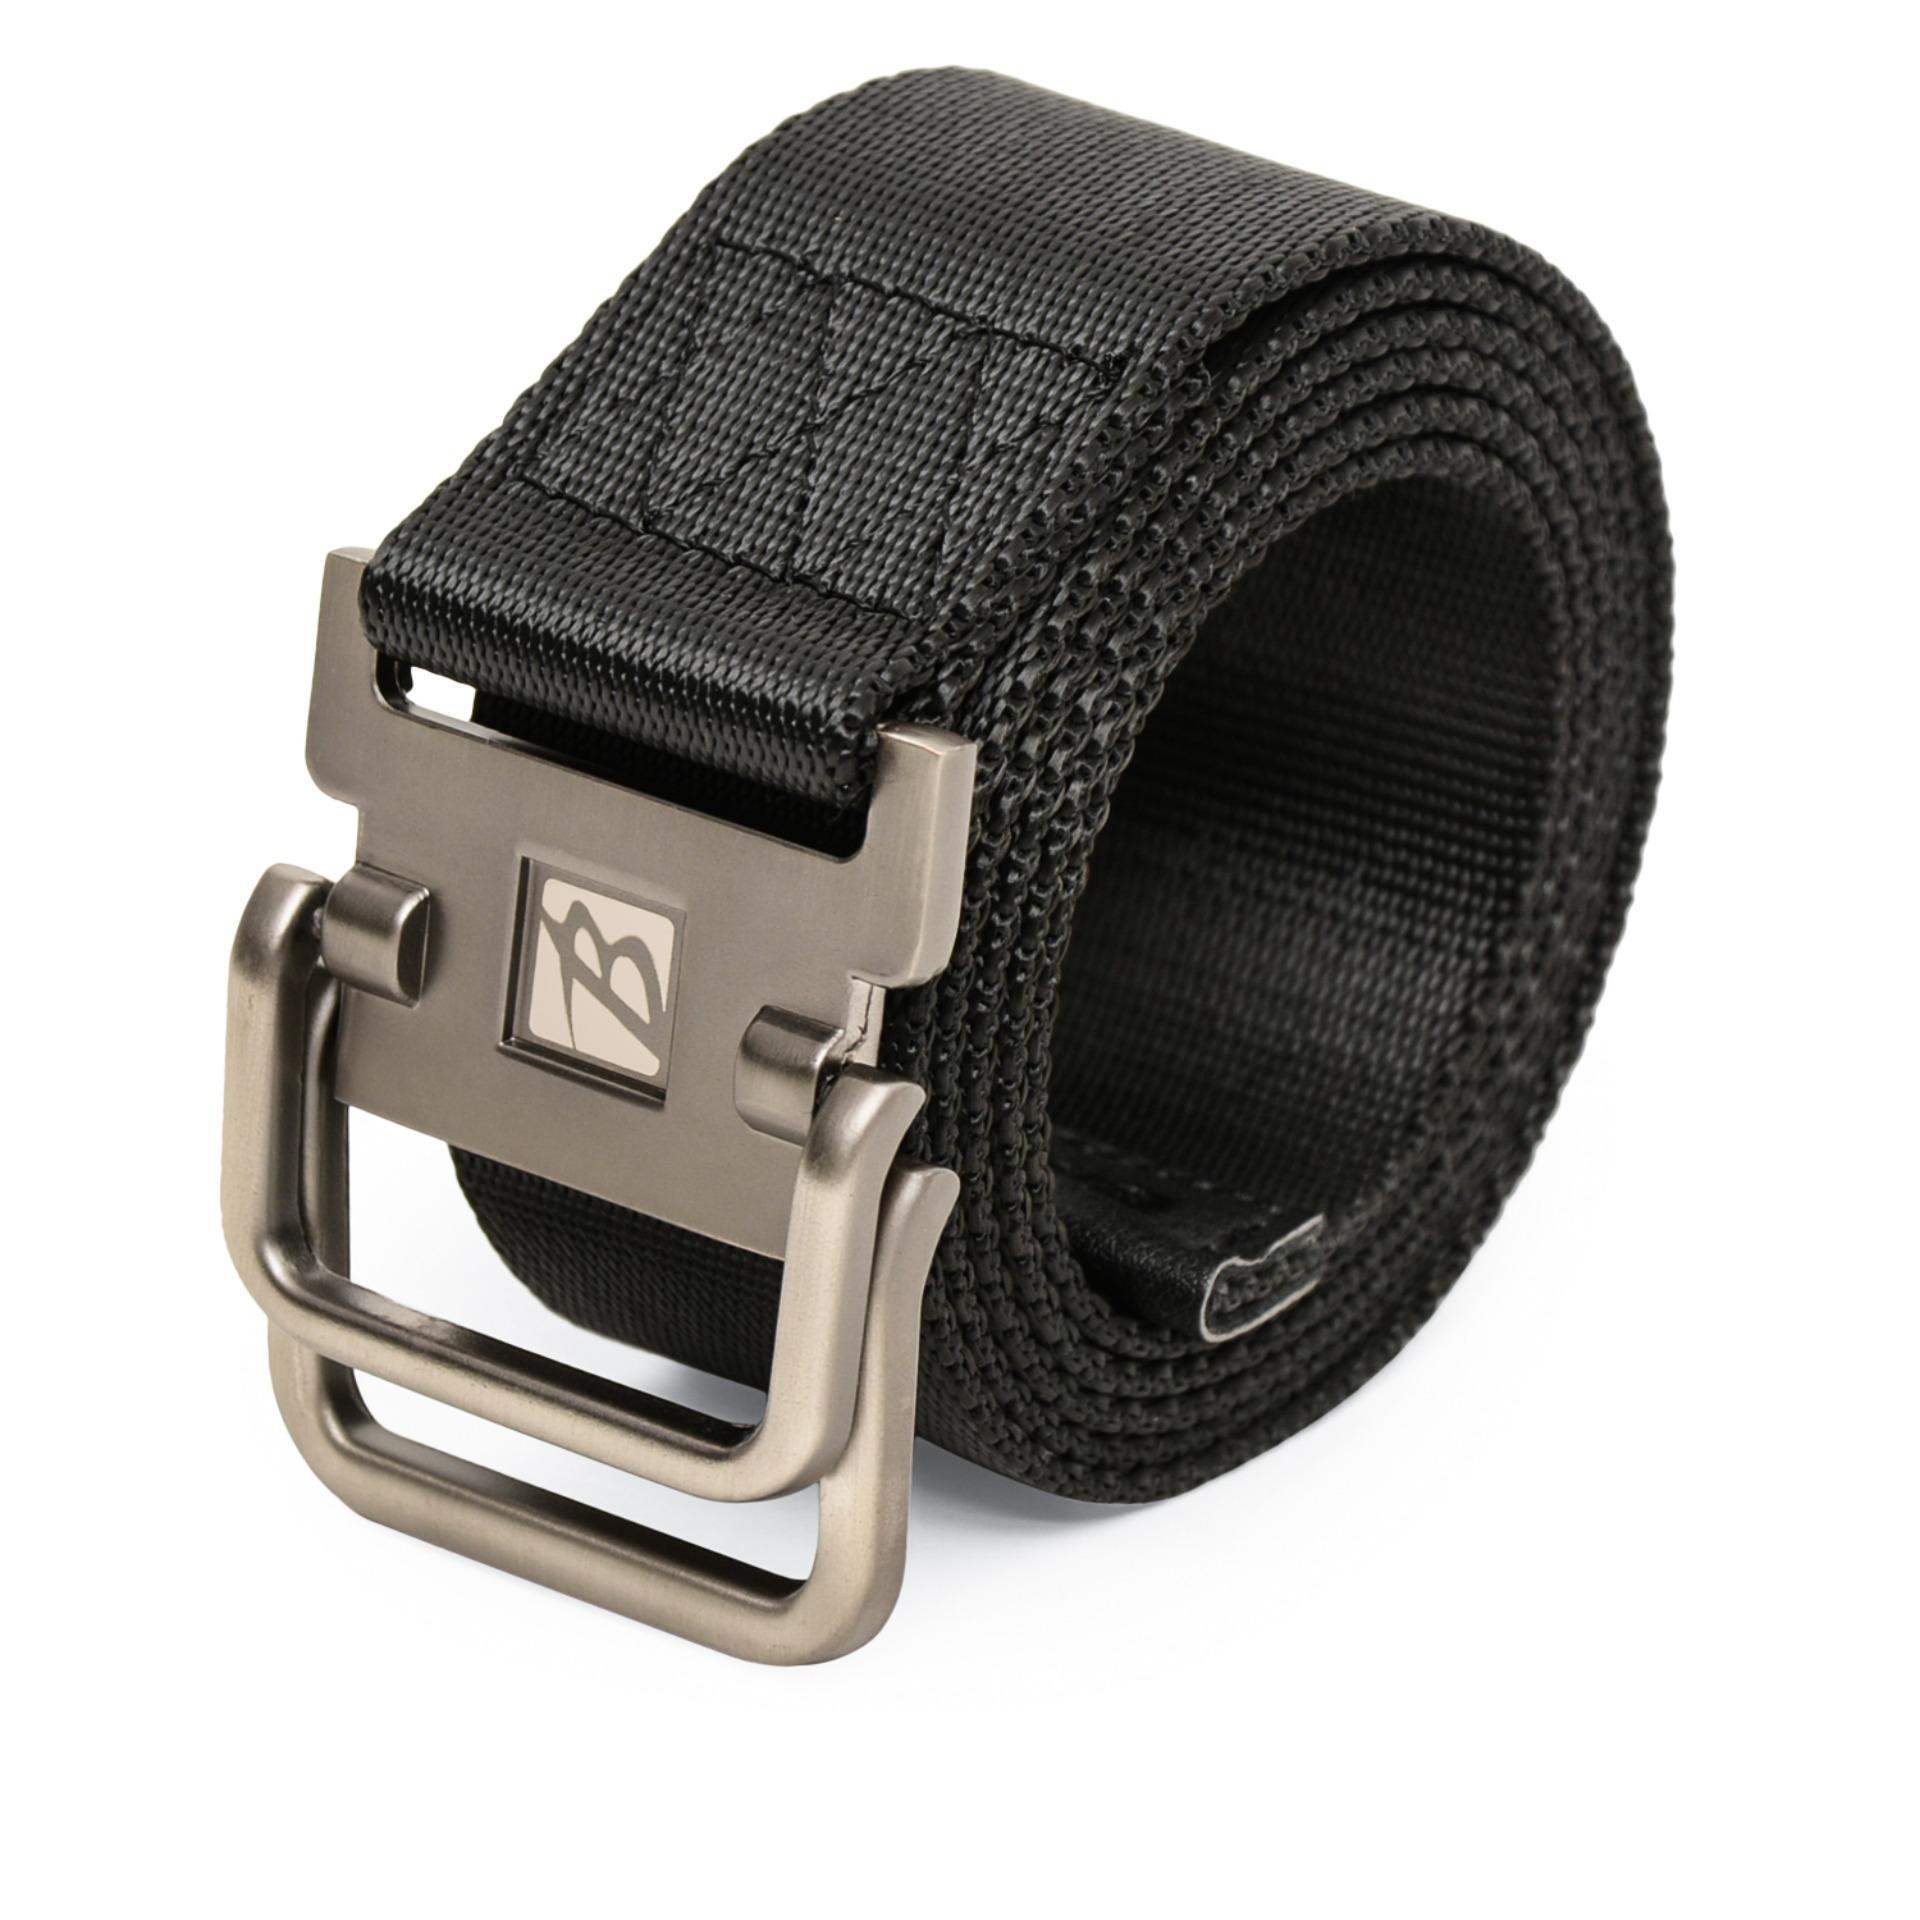 BREWYN Double Metal Buckle Canvas Belt / Ikat pinggang pria / Sabuk Pria - JACKSON - HITAM